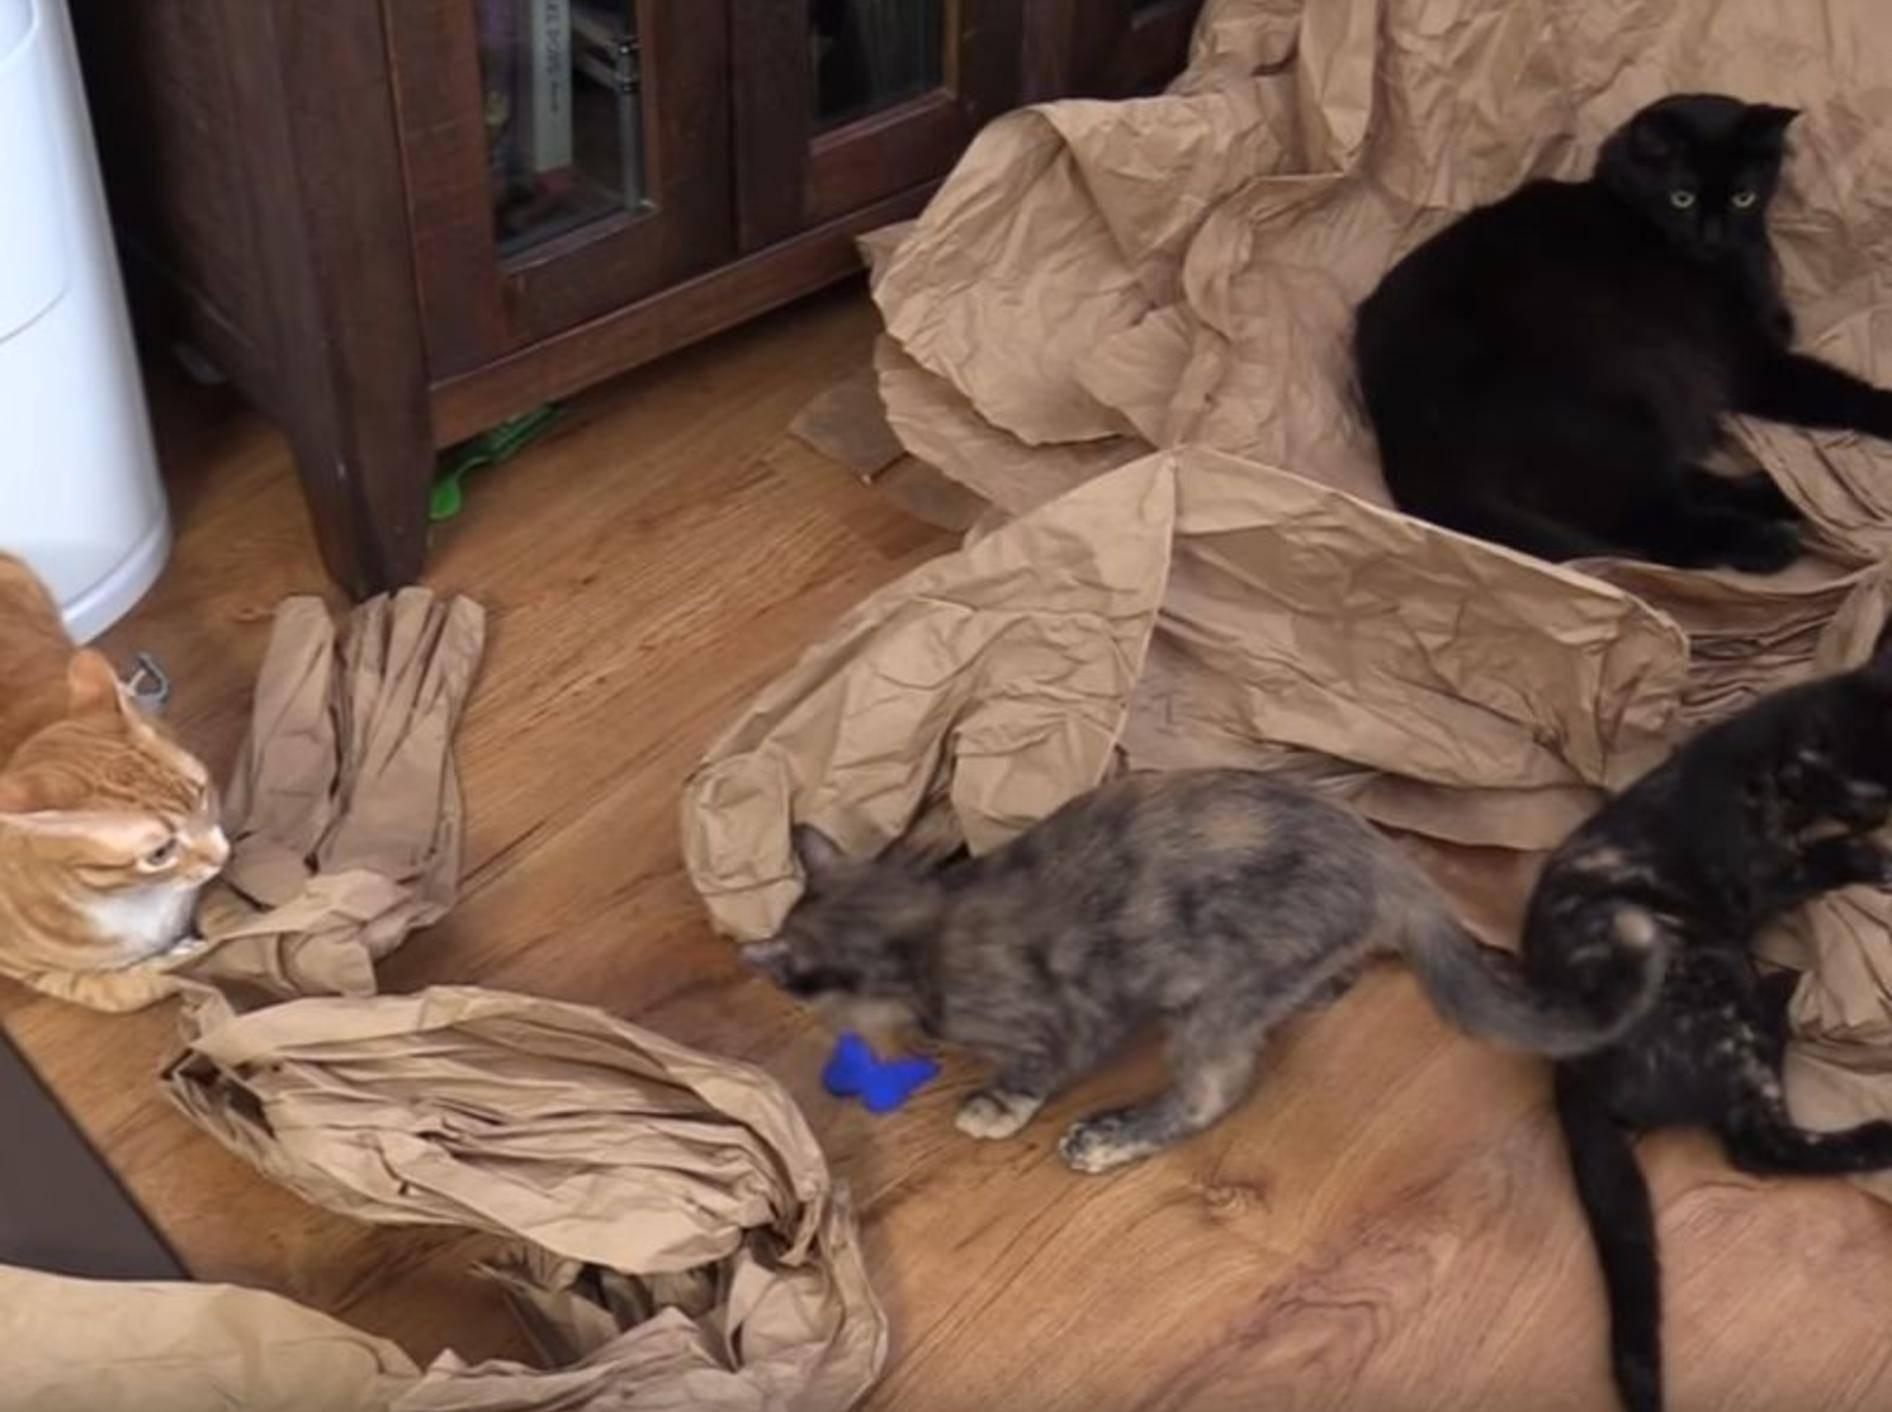 Cole & Marmalade treffen auf ihre Katzenschwestern Jugg & Zig Zag – YouTube / Cole and Marmalade